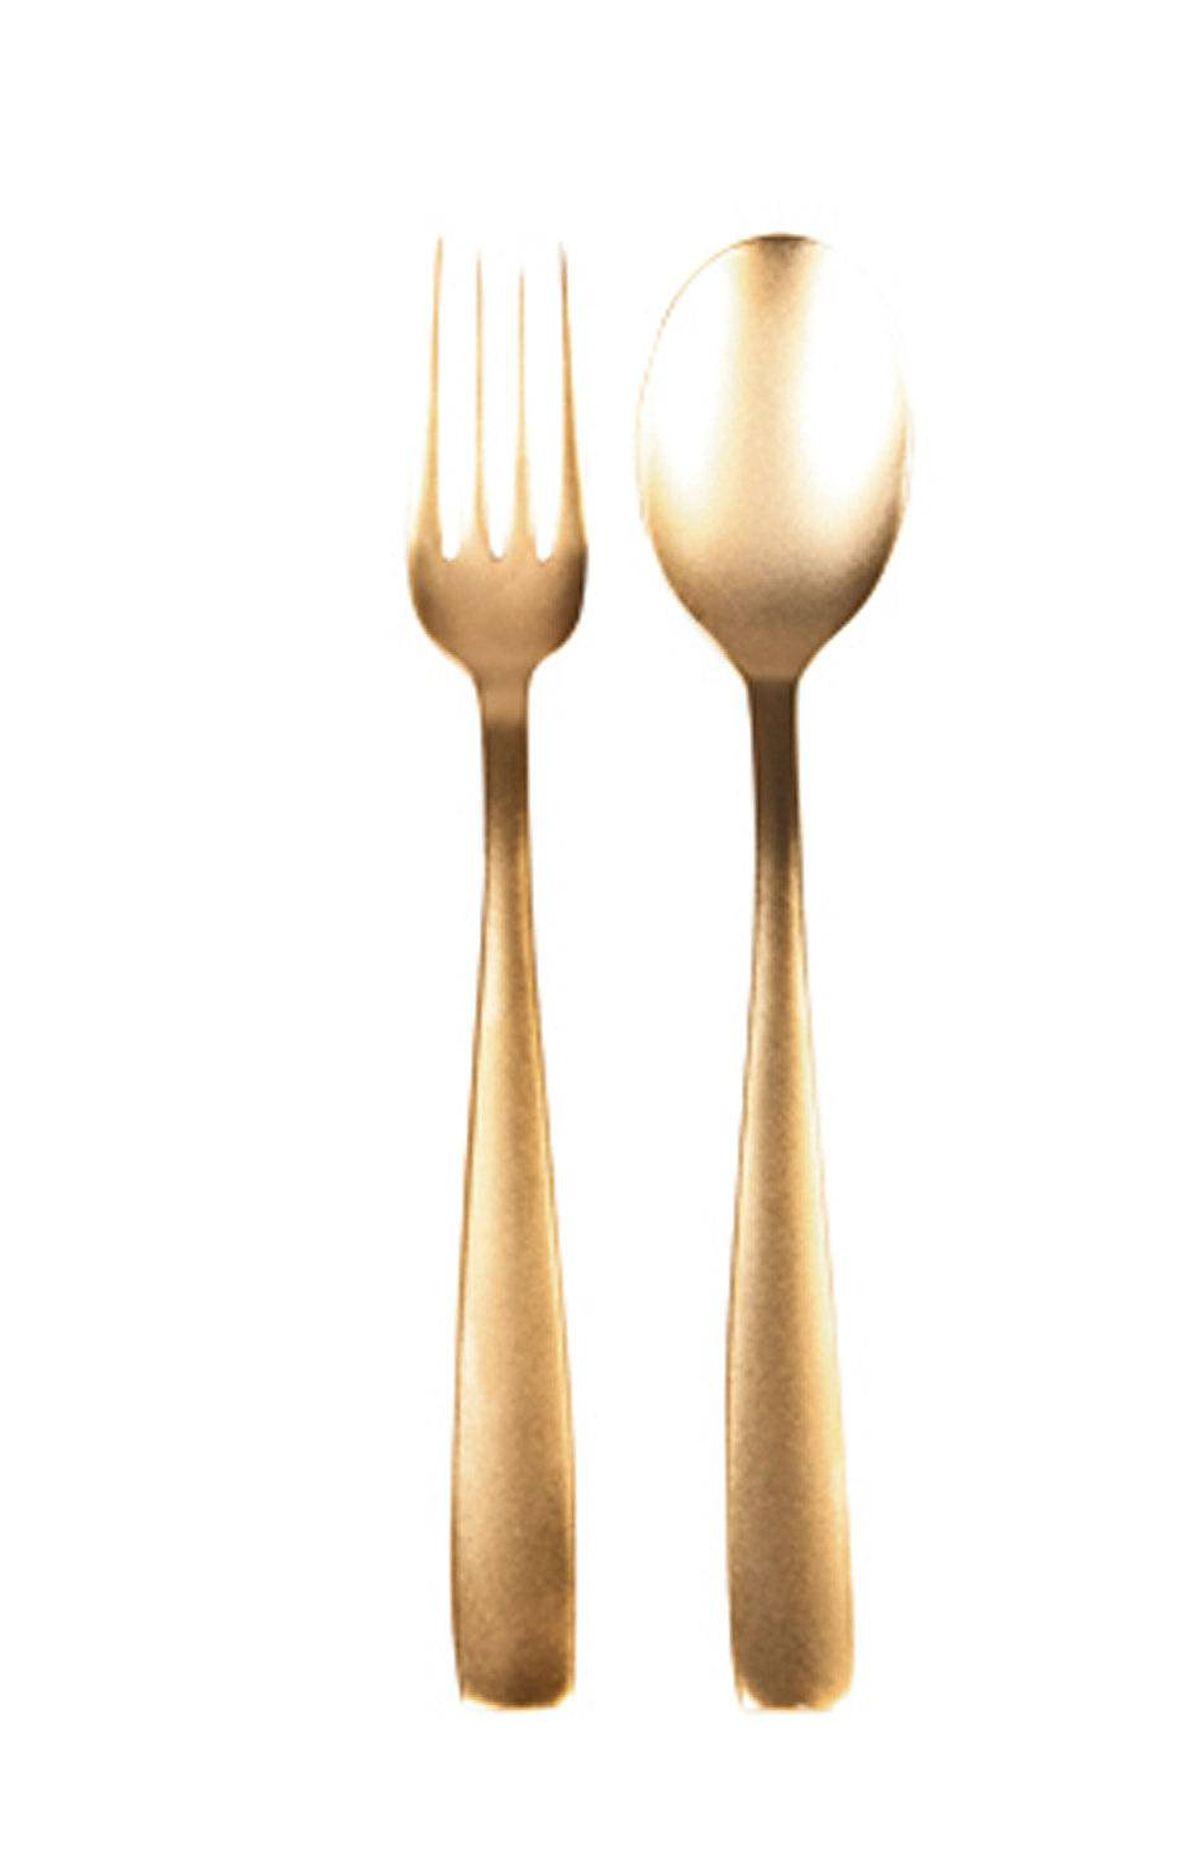 24-piece Midas Cutlery set, $250 at Good Egg (www.goodegg.ca).